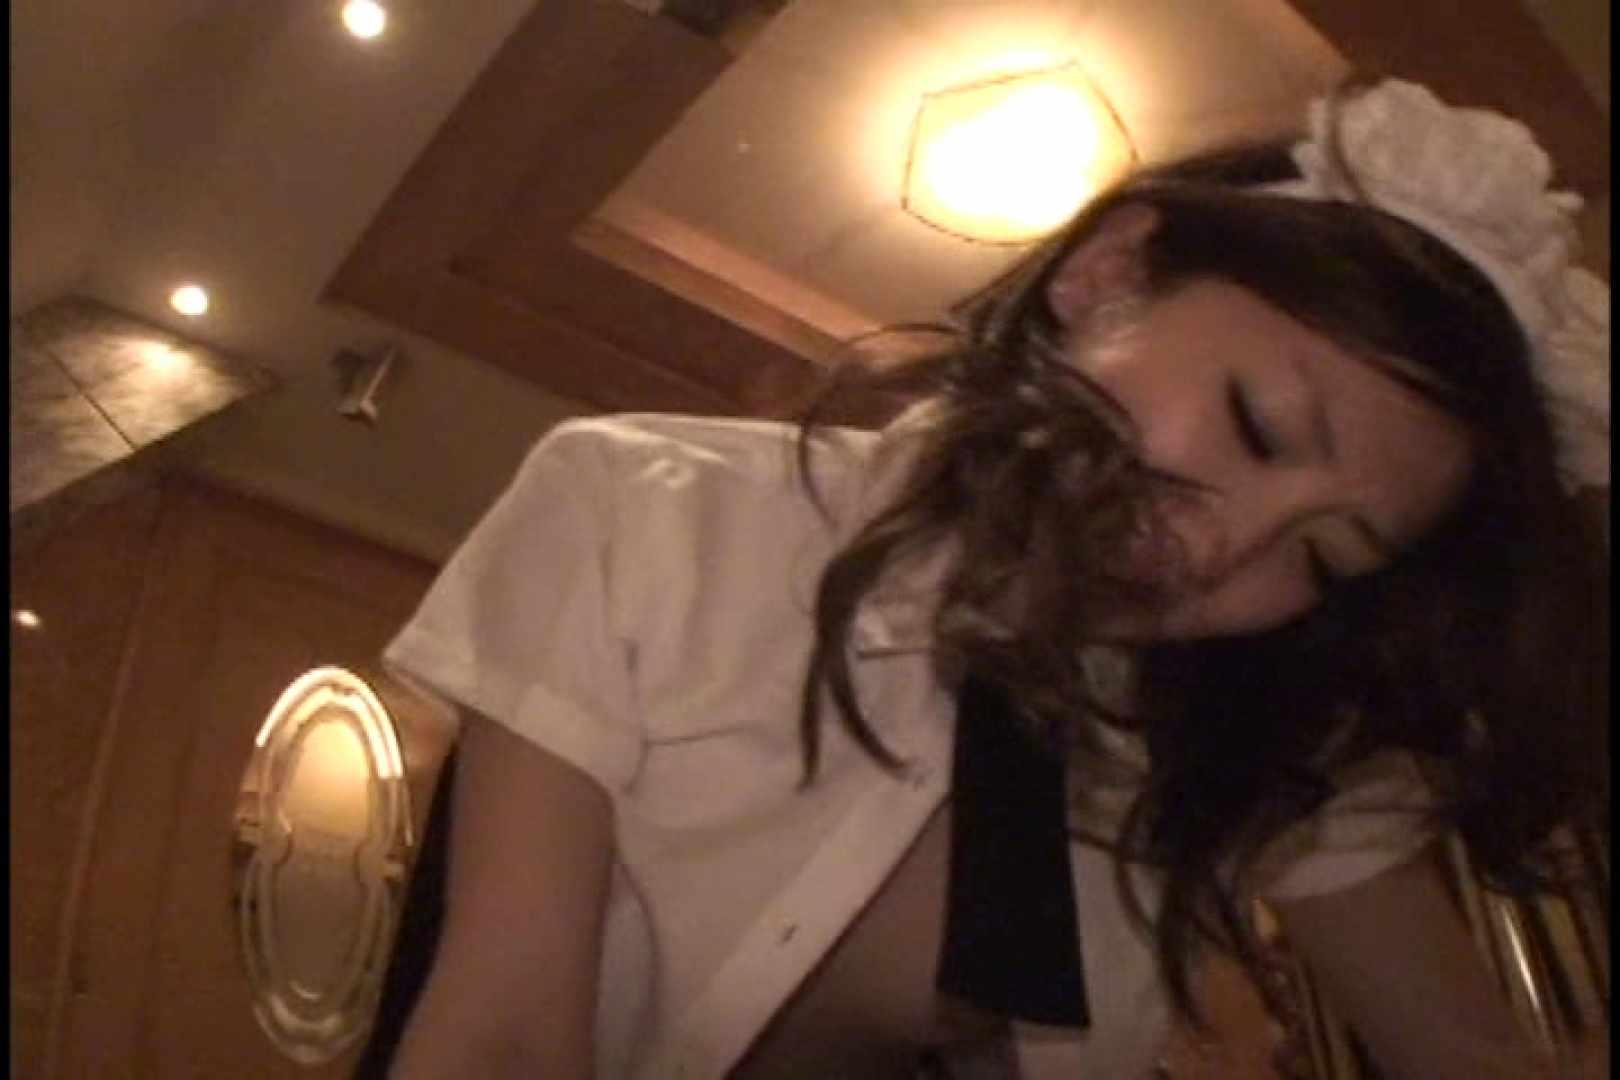 JDハンター全国ツアー vol.041 前編 女子大生のエロ動画  85PIX 14